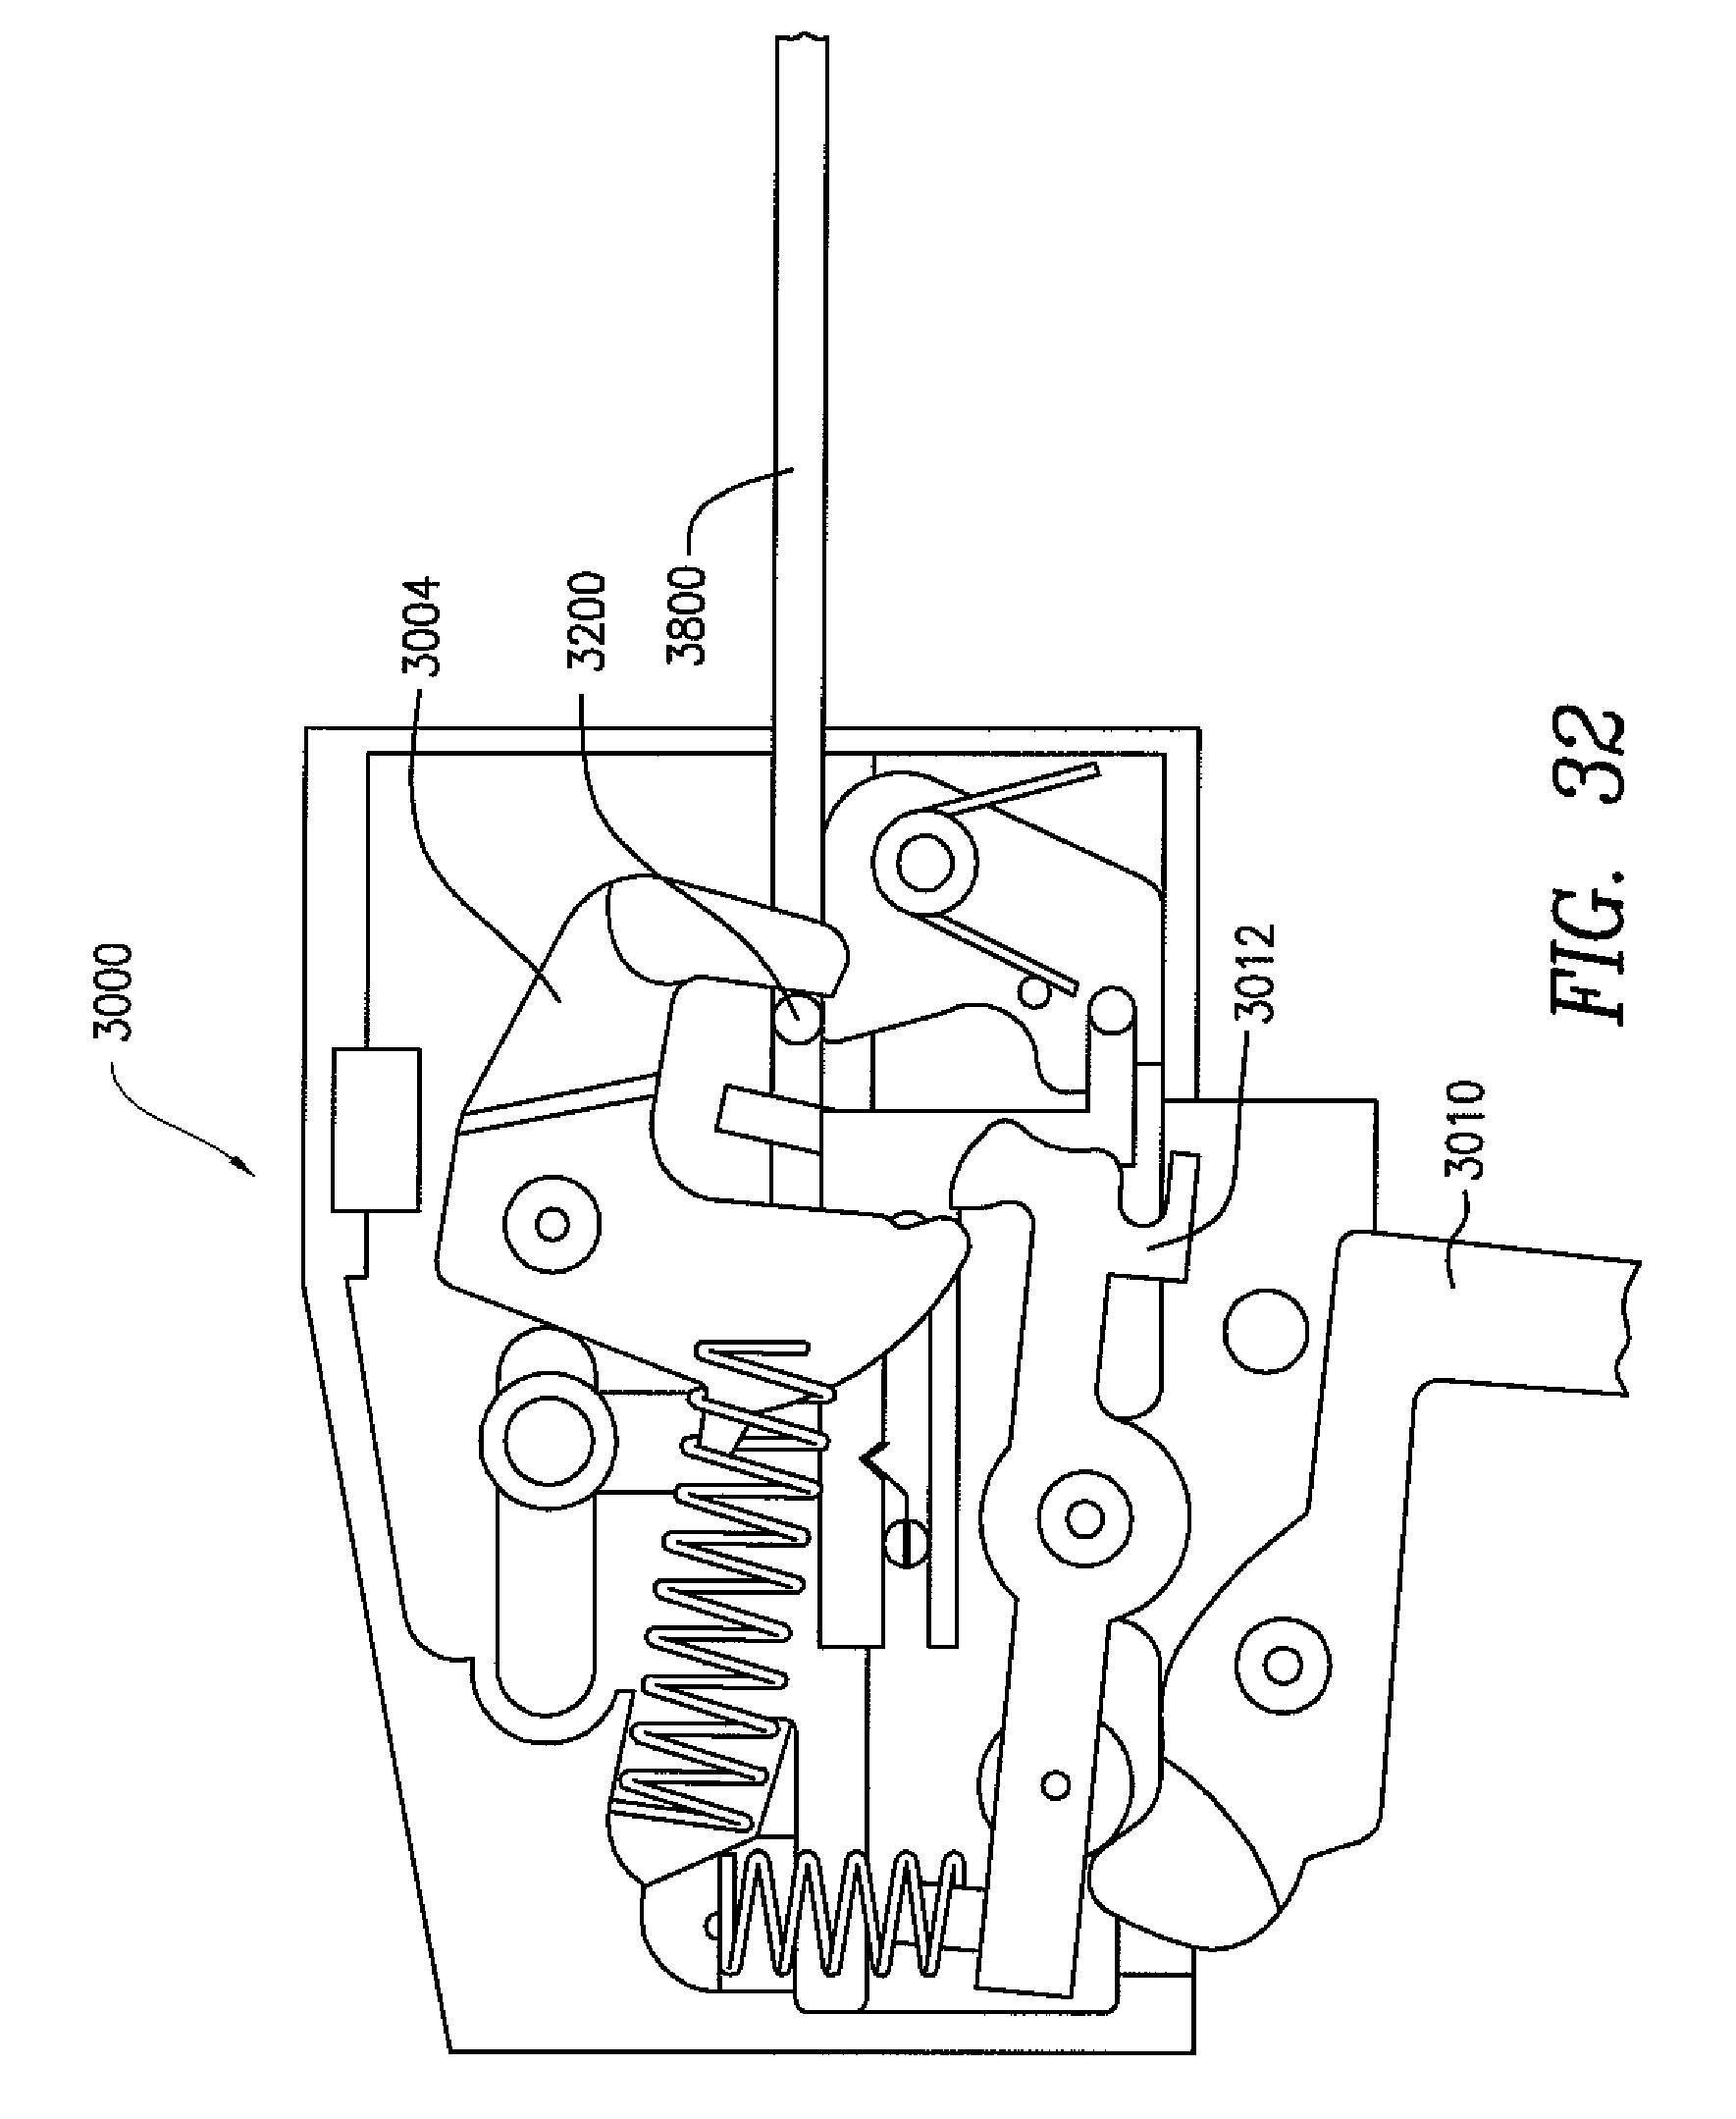 1995 Nissan 240sx Wiring Diagram - Wiring Solutions